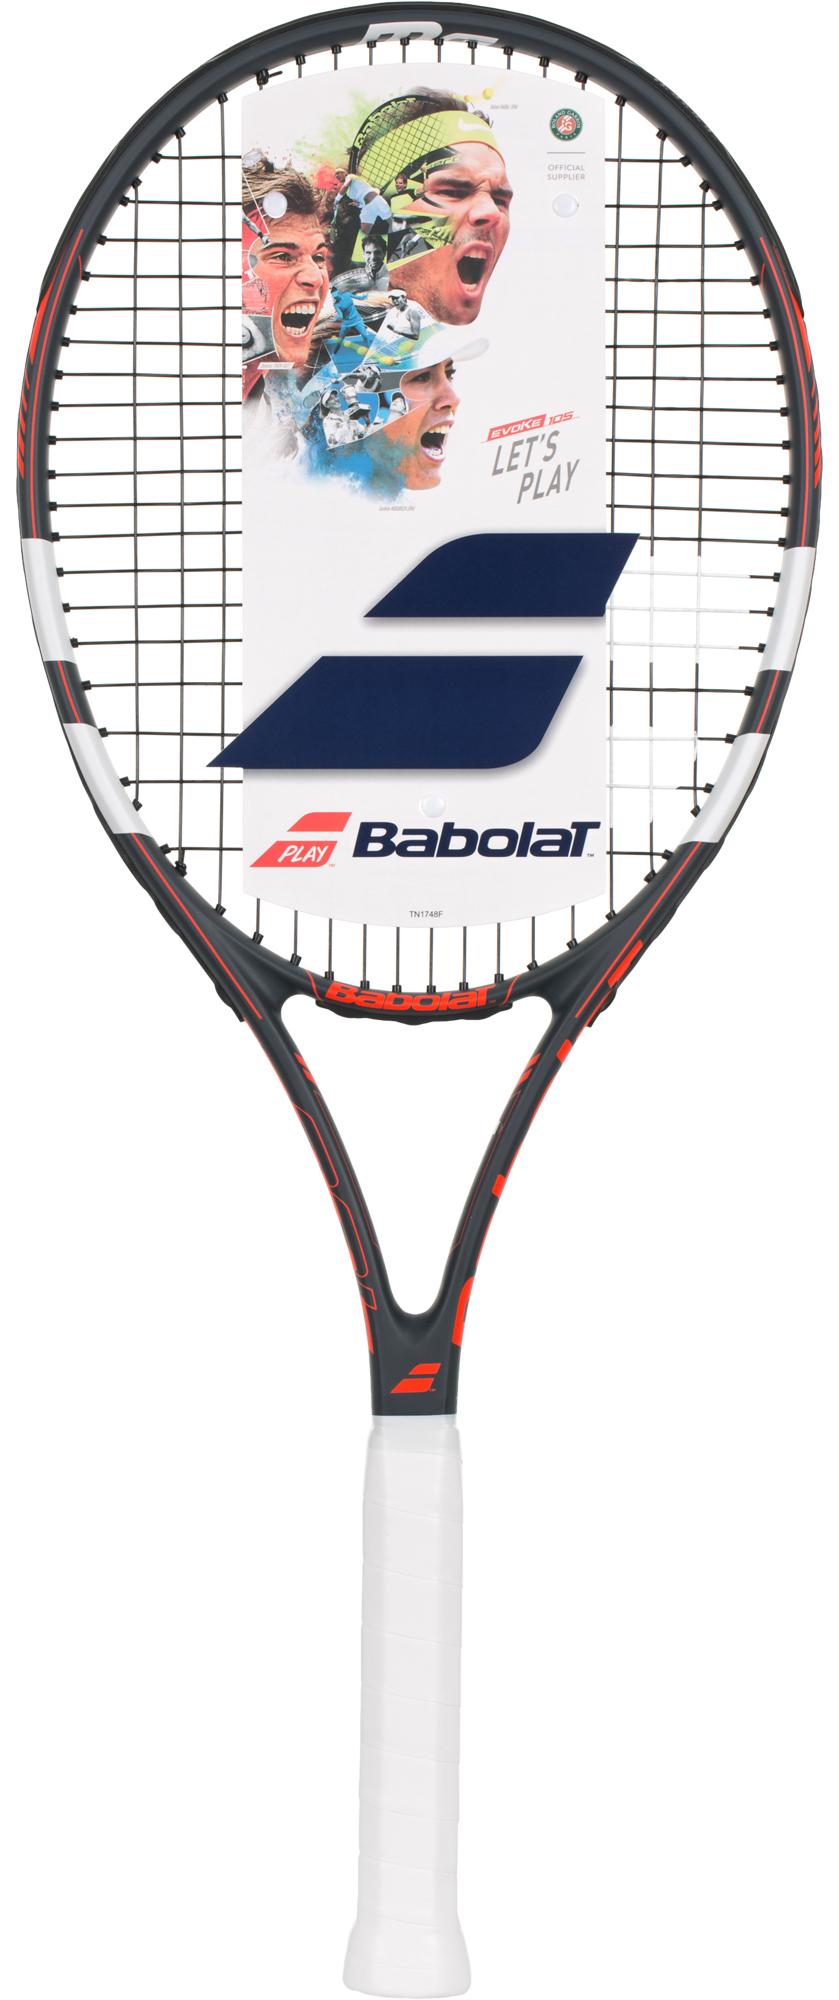 Babolat Ракетка для большого тенниса Babolat Evoke 105, размер 3 babolat ракетка для большого тенниса детская babolat ballfighter 23 размер без размера